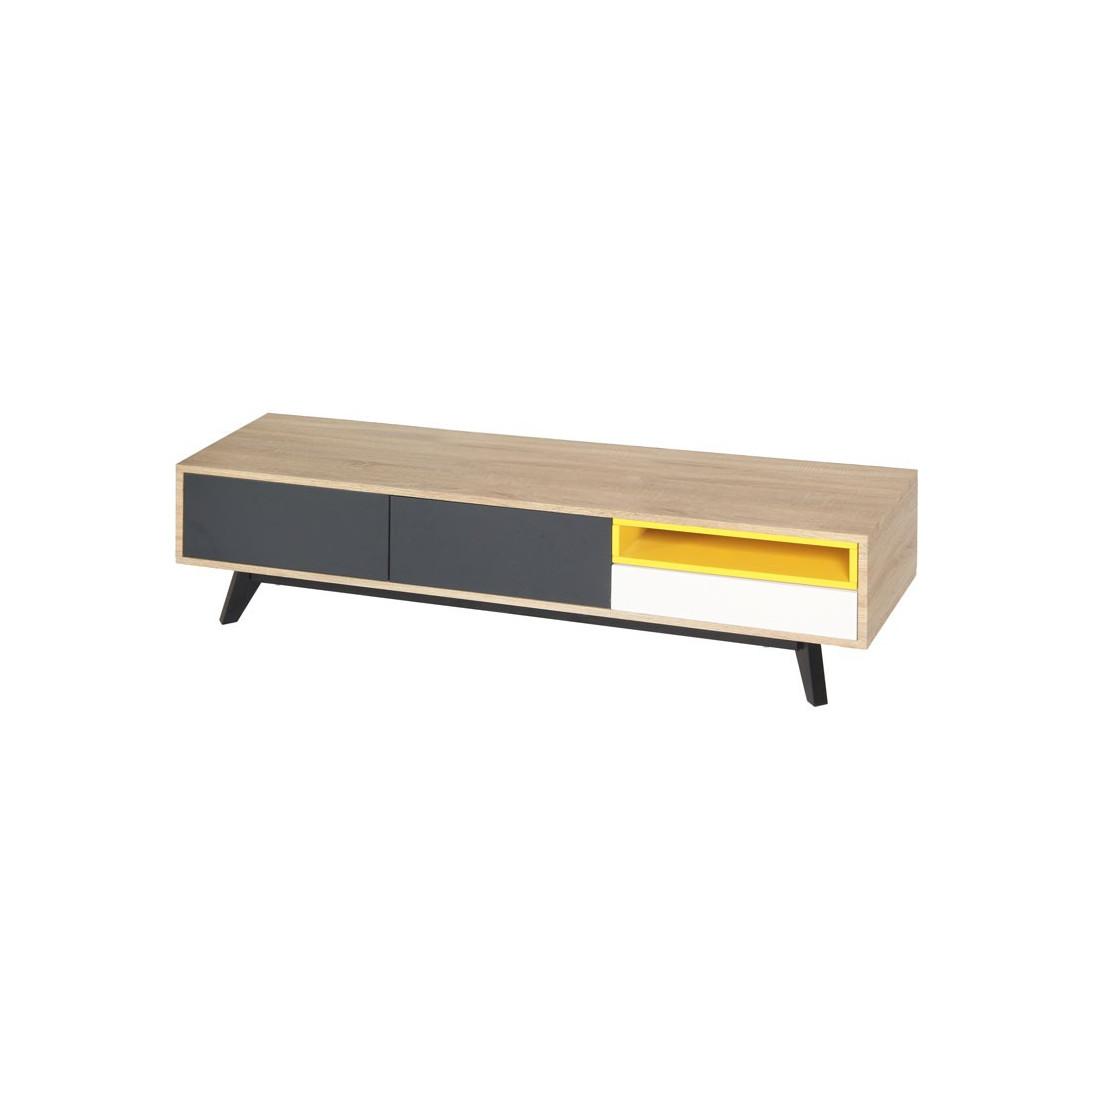 Meuble tv 2 portes 1 tiroir jaune gris blanc scud for Meuble 2 porte 2 tiroir